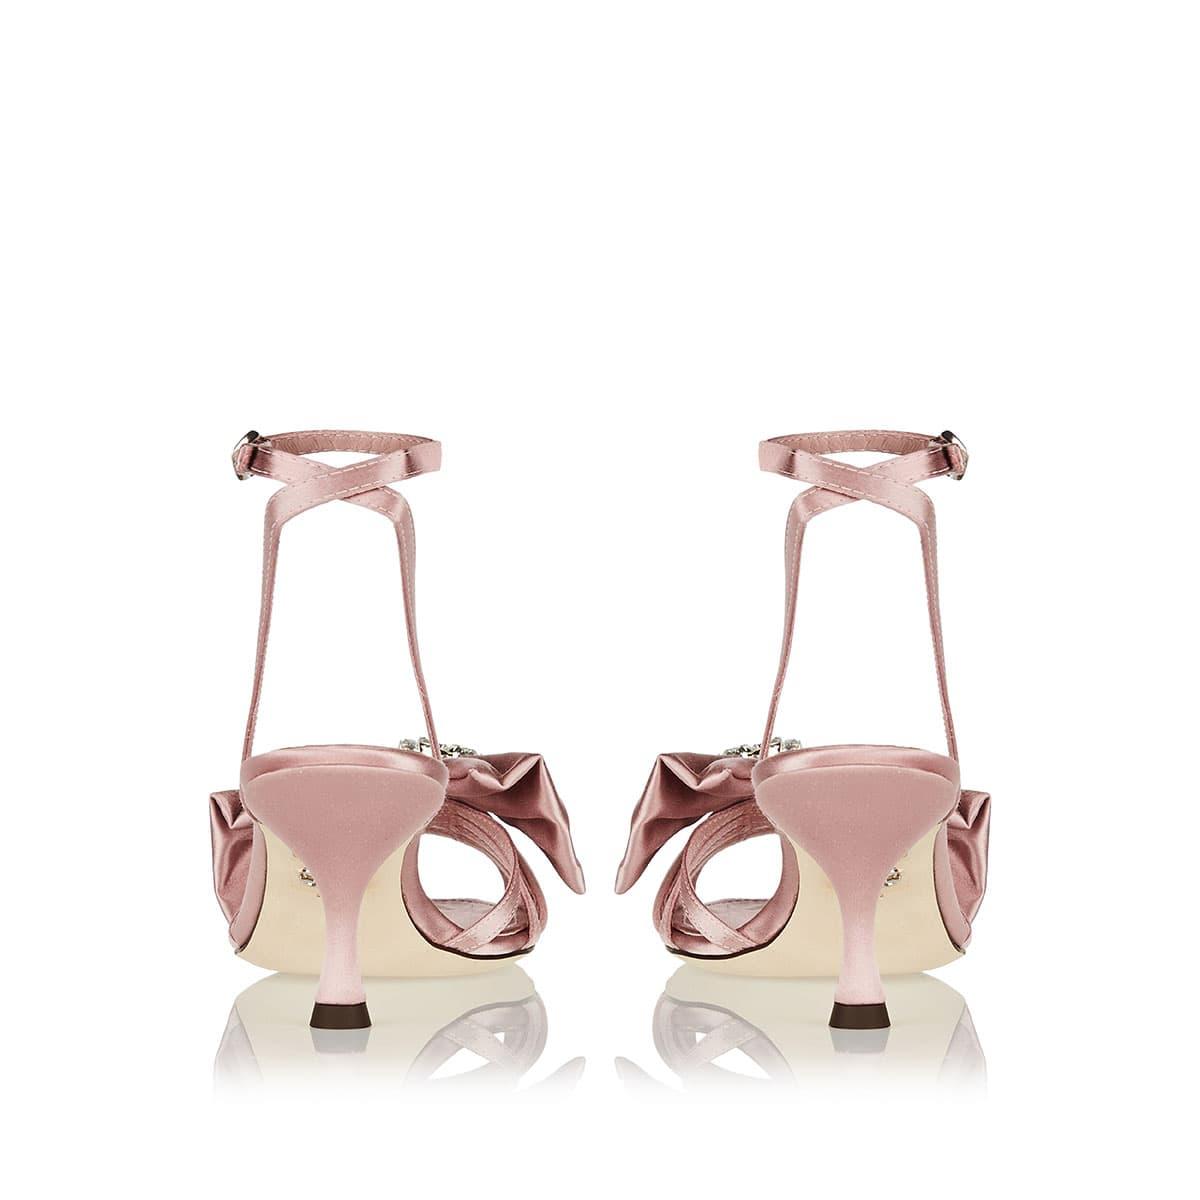 Jeweled satin sandals